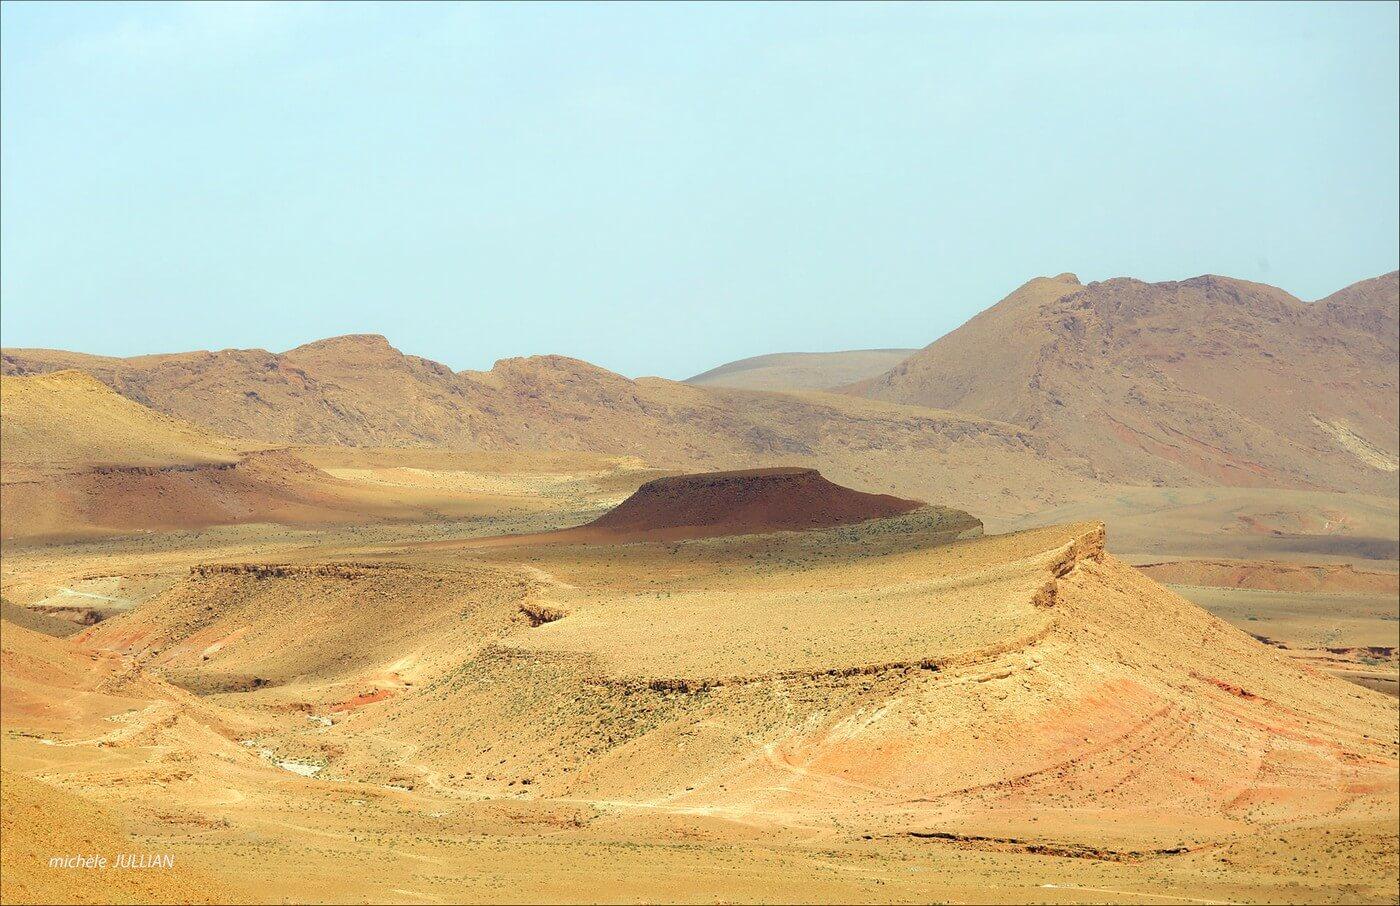 désert marocain en pays berbère